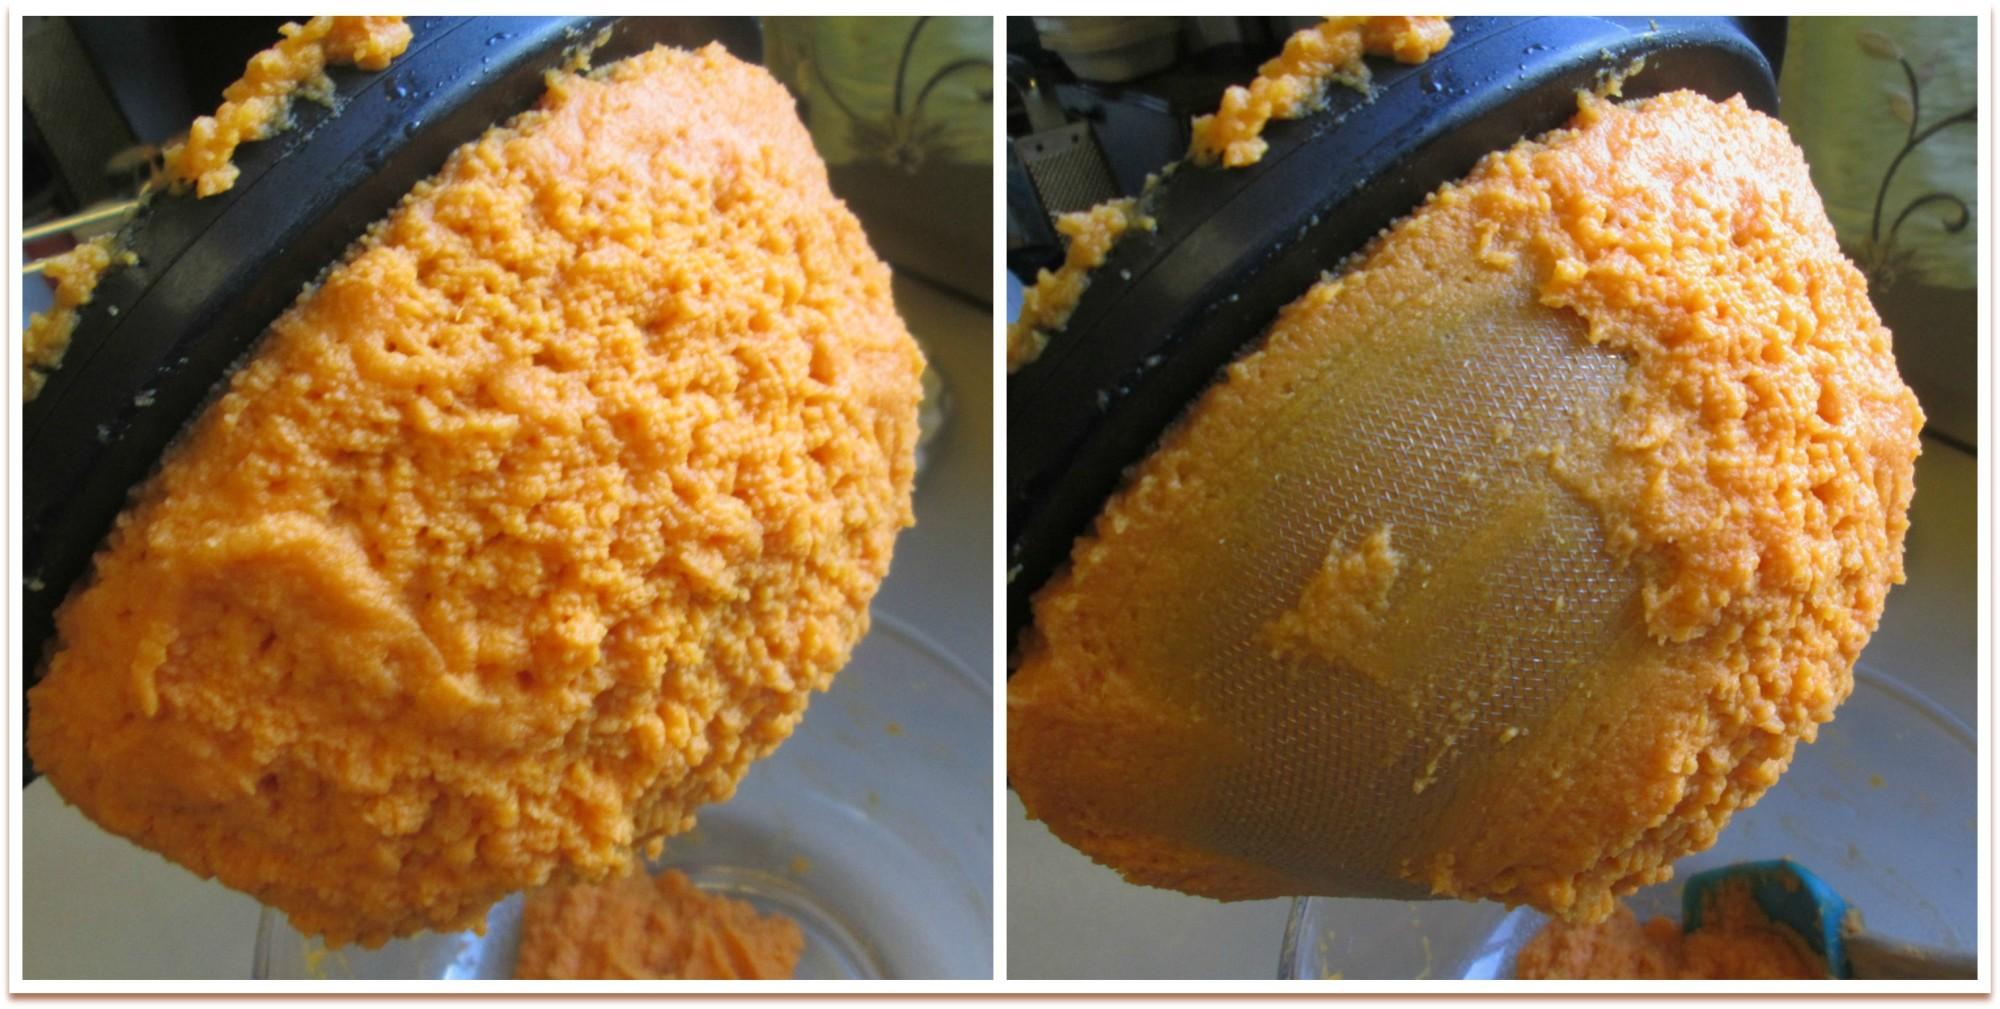 Sweet Potatoes pushed through sieve for ultra creamy, non-stringy sweet potato mash. Portlandia Pie Lady.